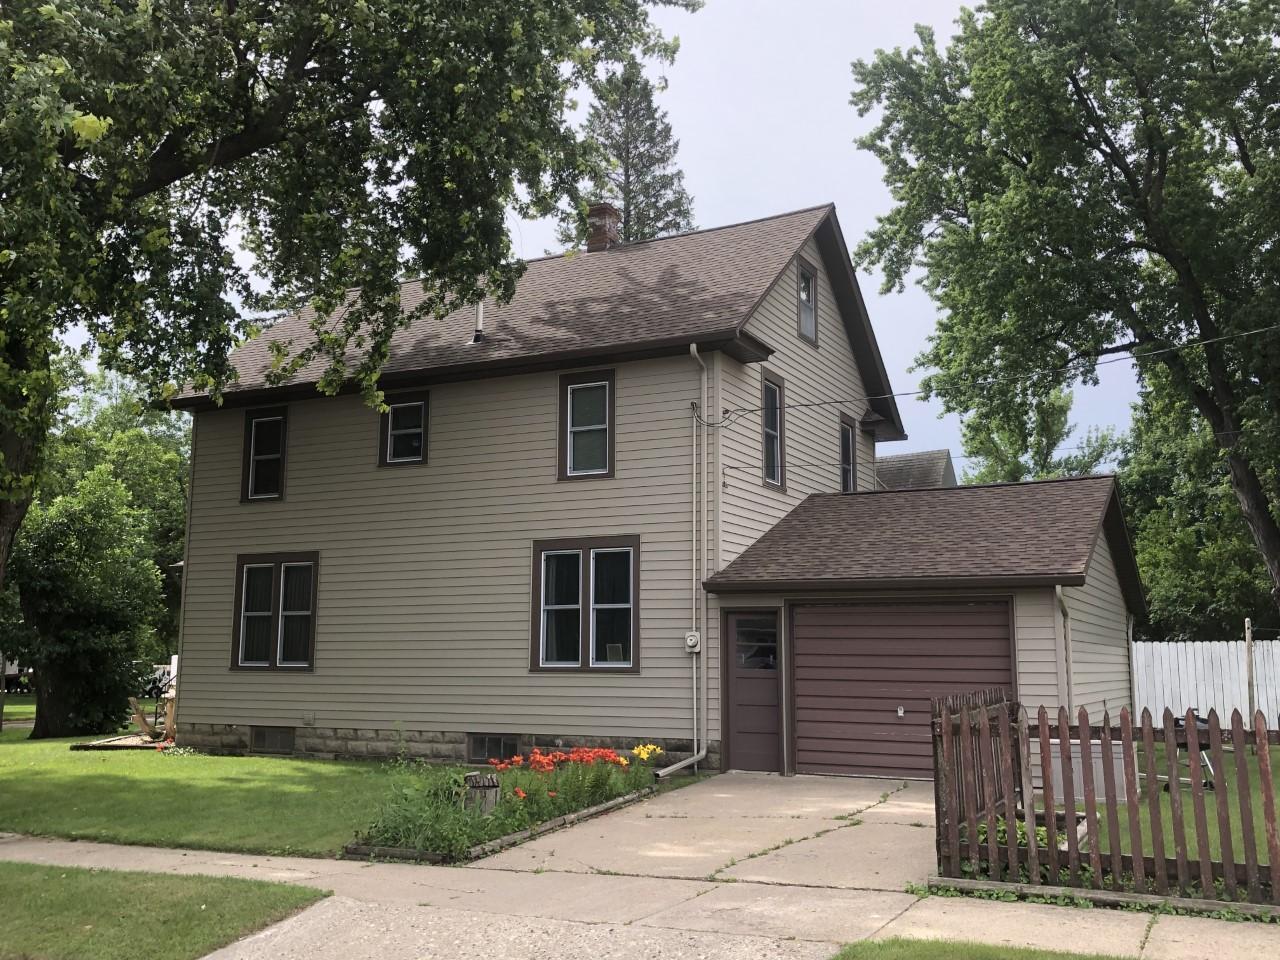 2606 Linden Property Photo - Slayton, MN real estate listing